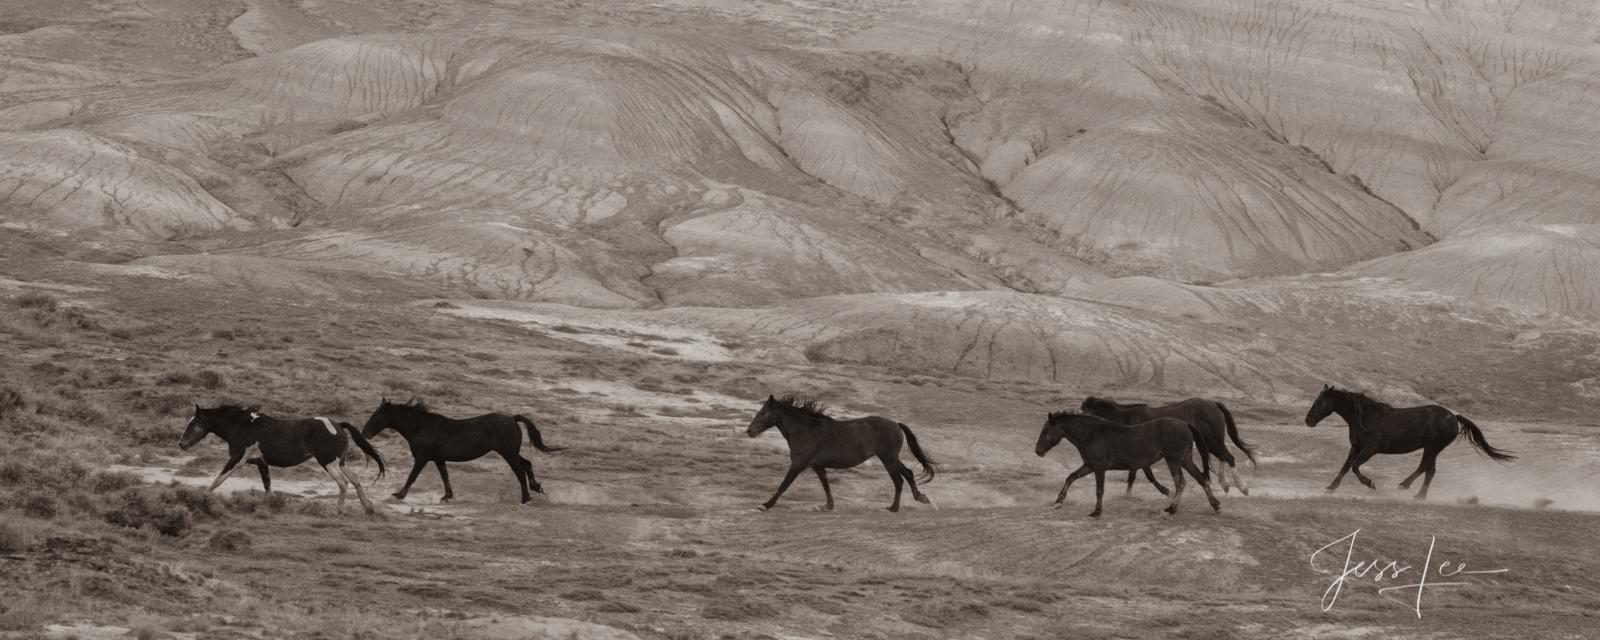 Wild horse photography, mustang, photos, prints, wall art, , photo